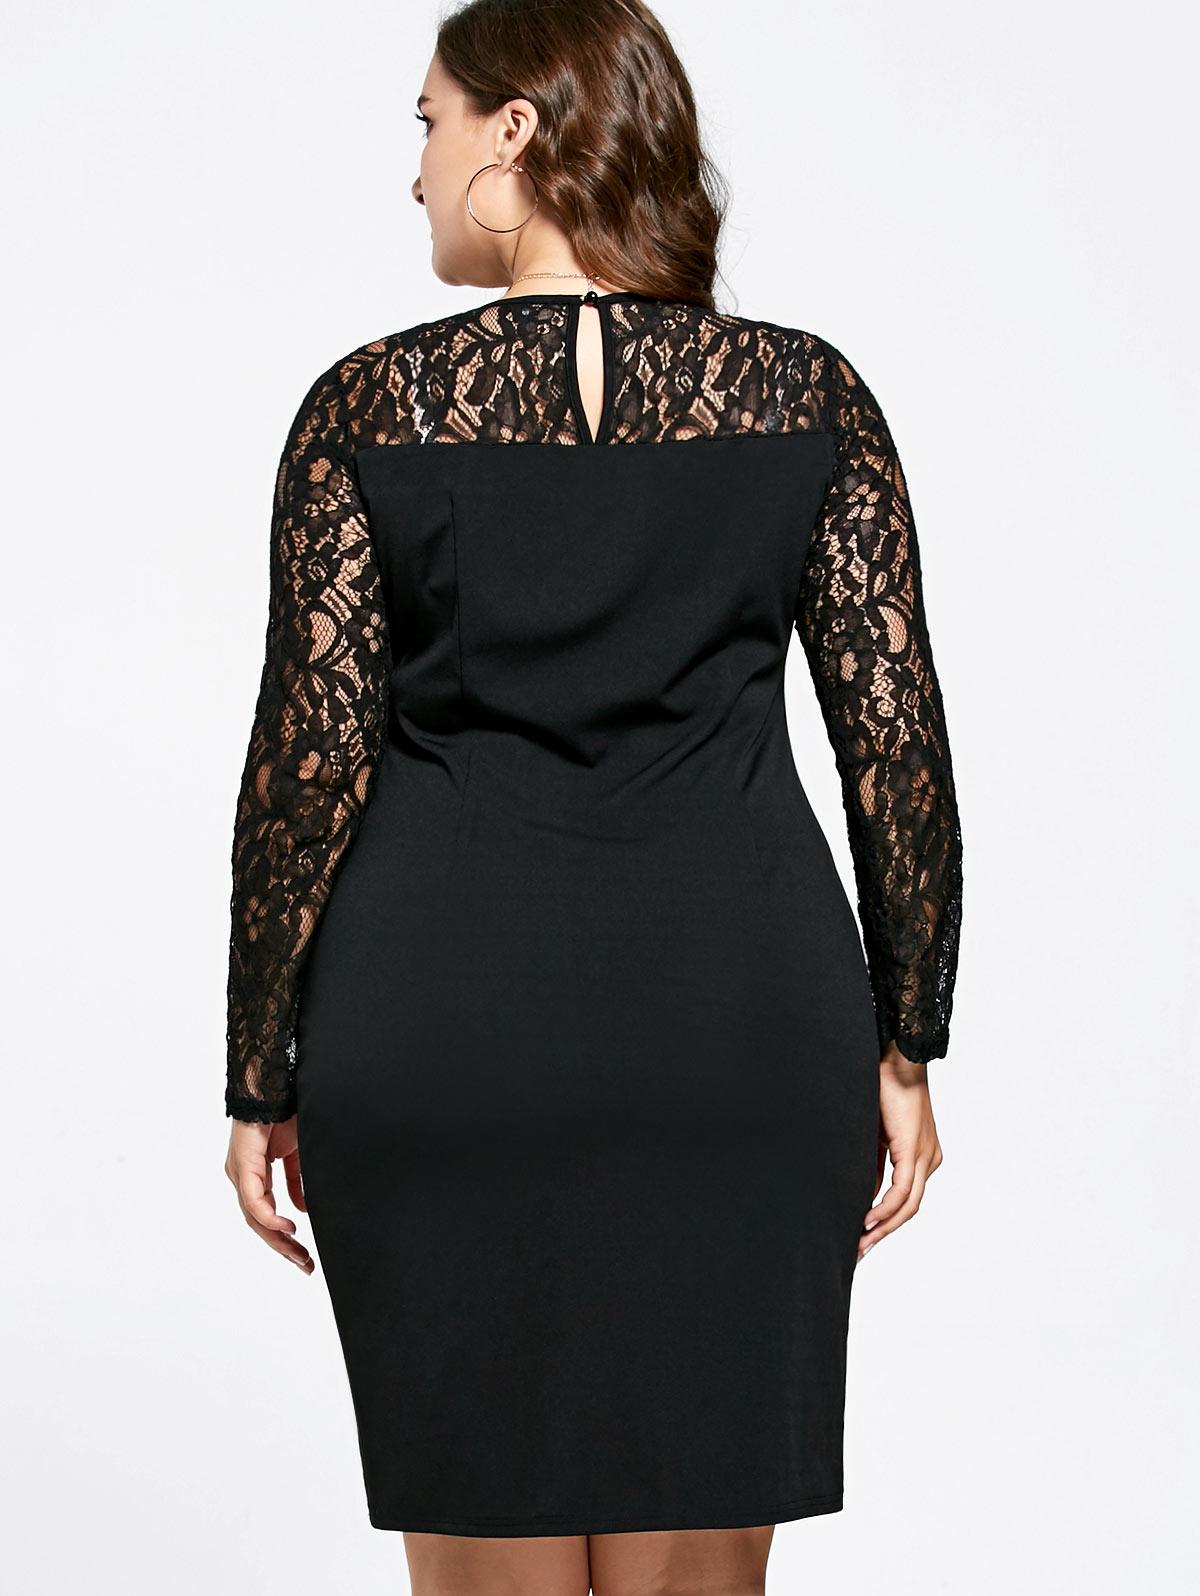 ... Sexy Lace Insert Dresses Asymmetric Long Sleeve Knee Length Bodycon  Dress Vestidos Plus Size XL-5XL. Style  Brief Material  Lace 6b073911d89d